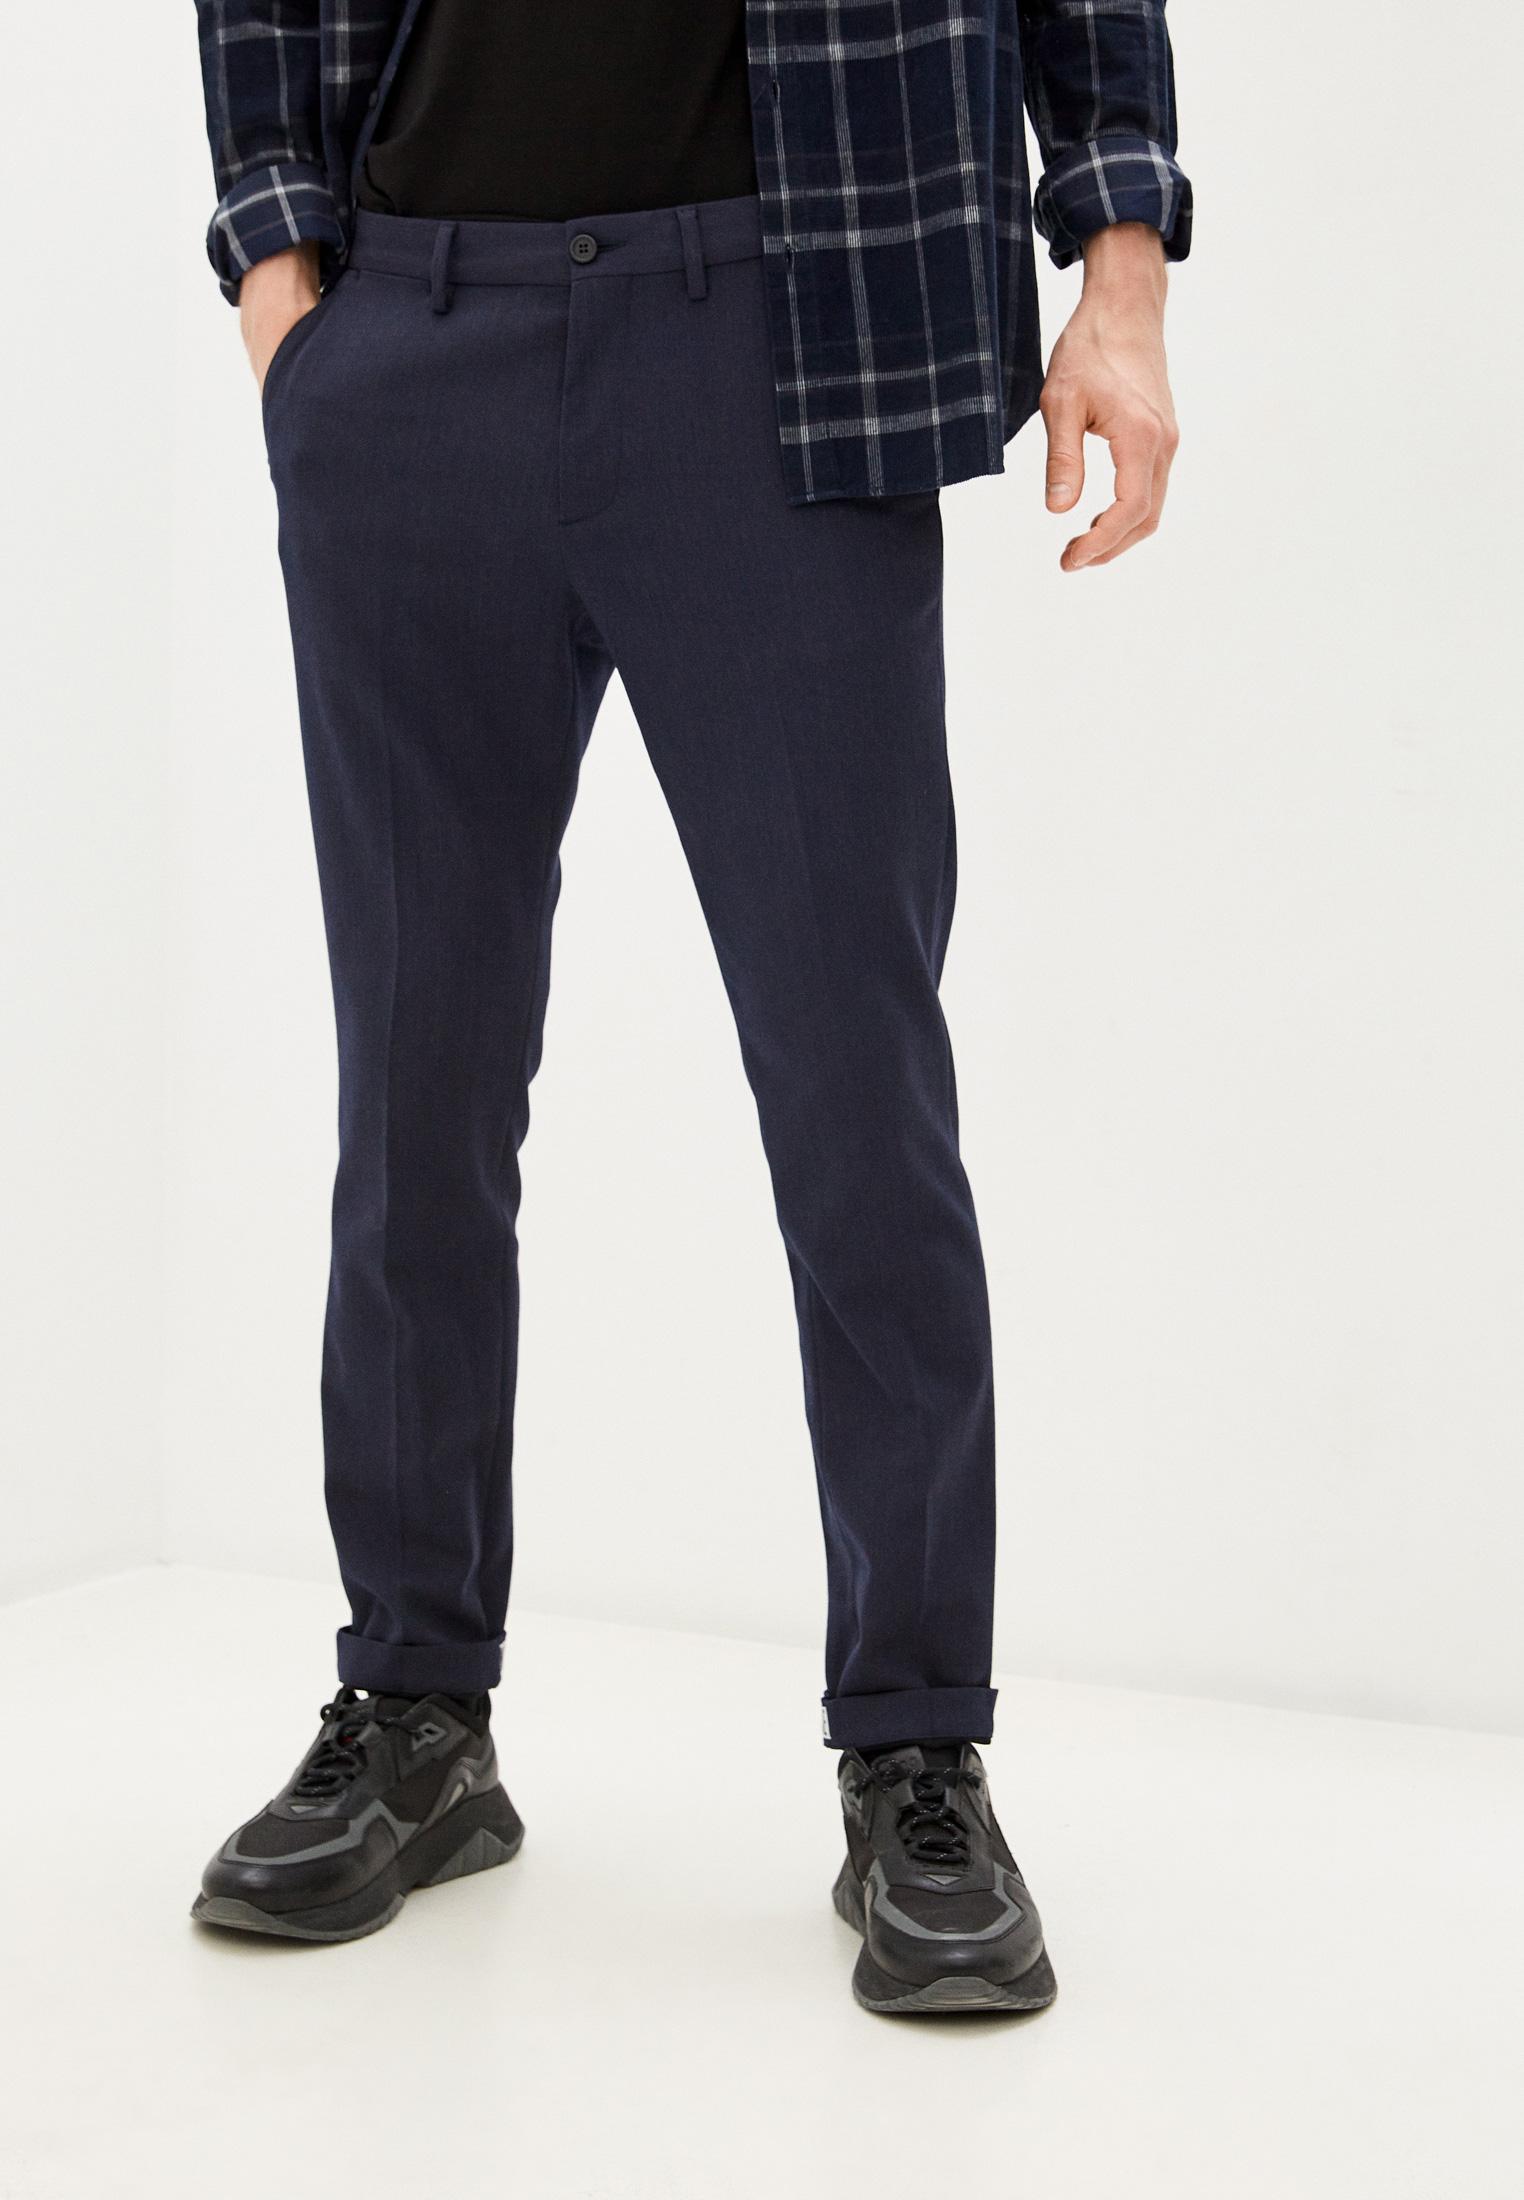 Мужские повседневные брюки Bikkembergs (Биккембергс) C P 001 00 S 3331